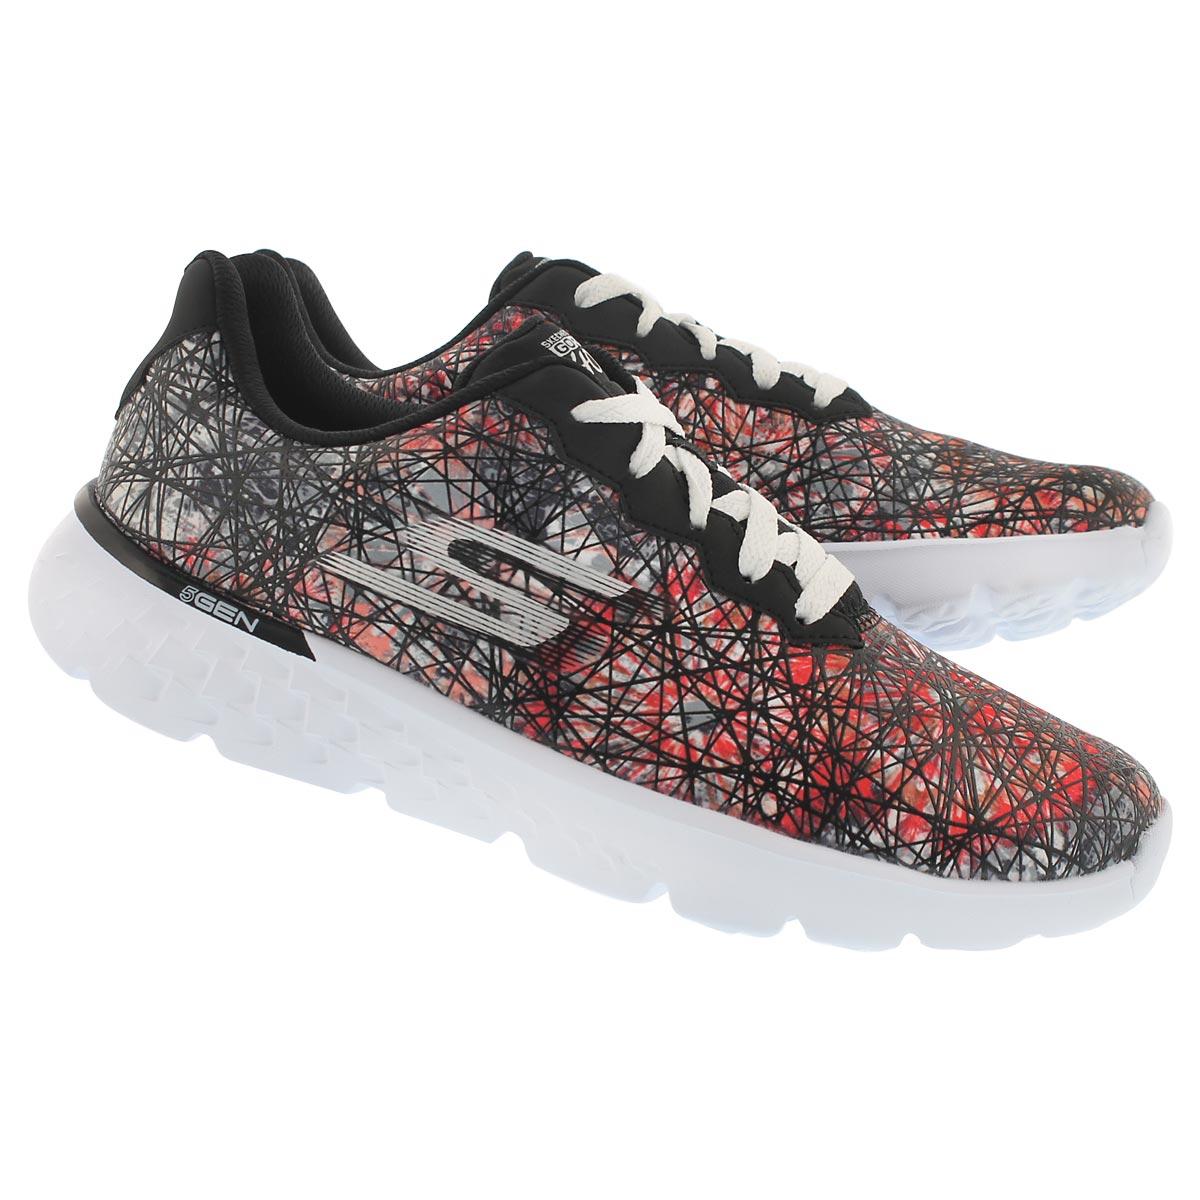 Lds GO Run 400 blk printed running shoe